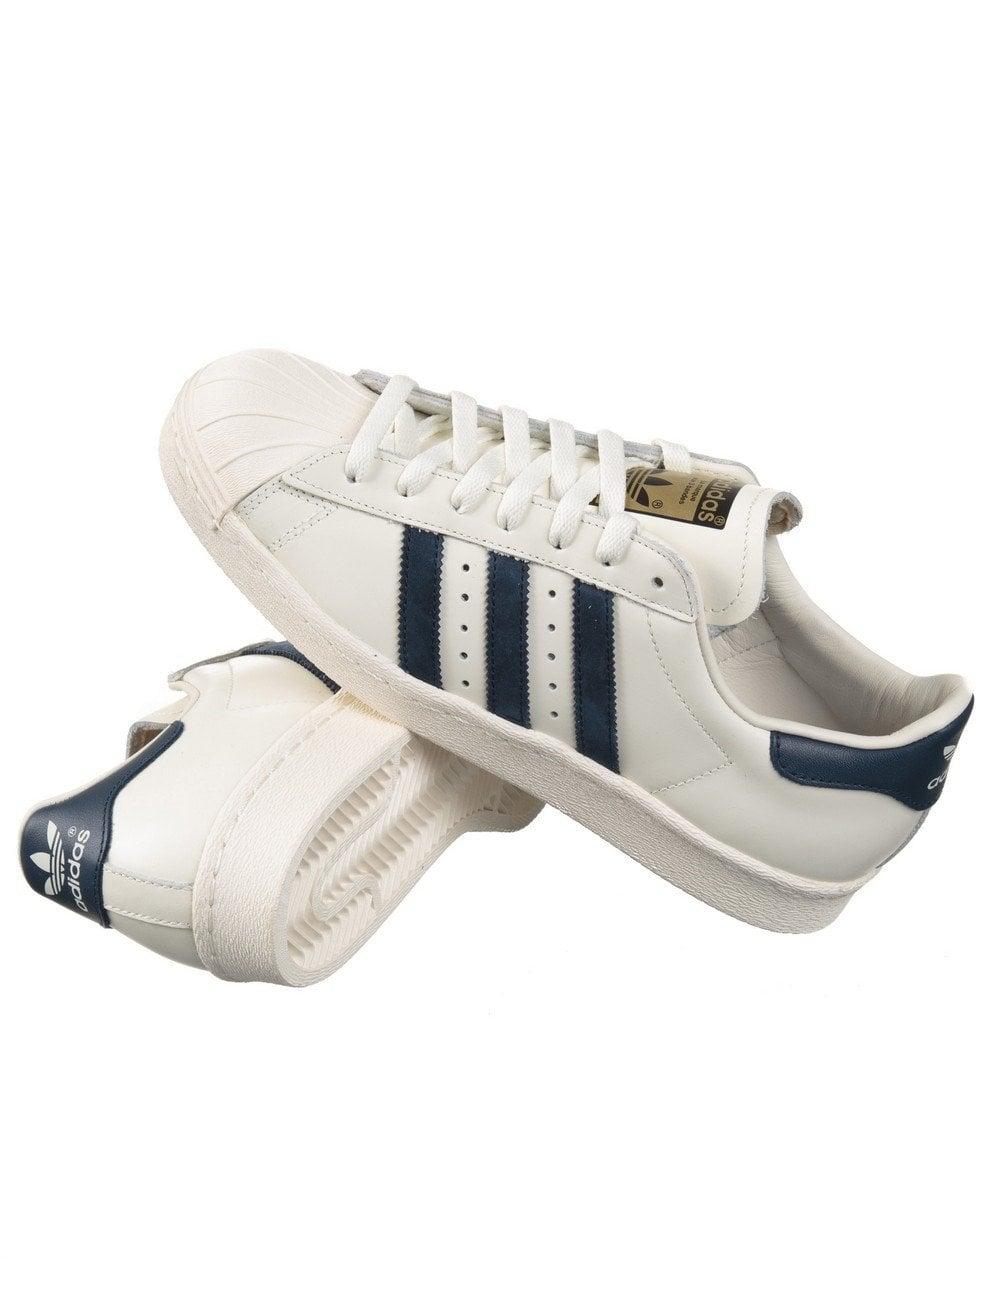 Bleu eu Superstar Vintage Sitiprofessionali Adidas vNwm0n8